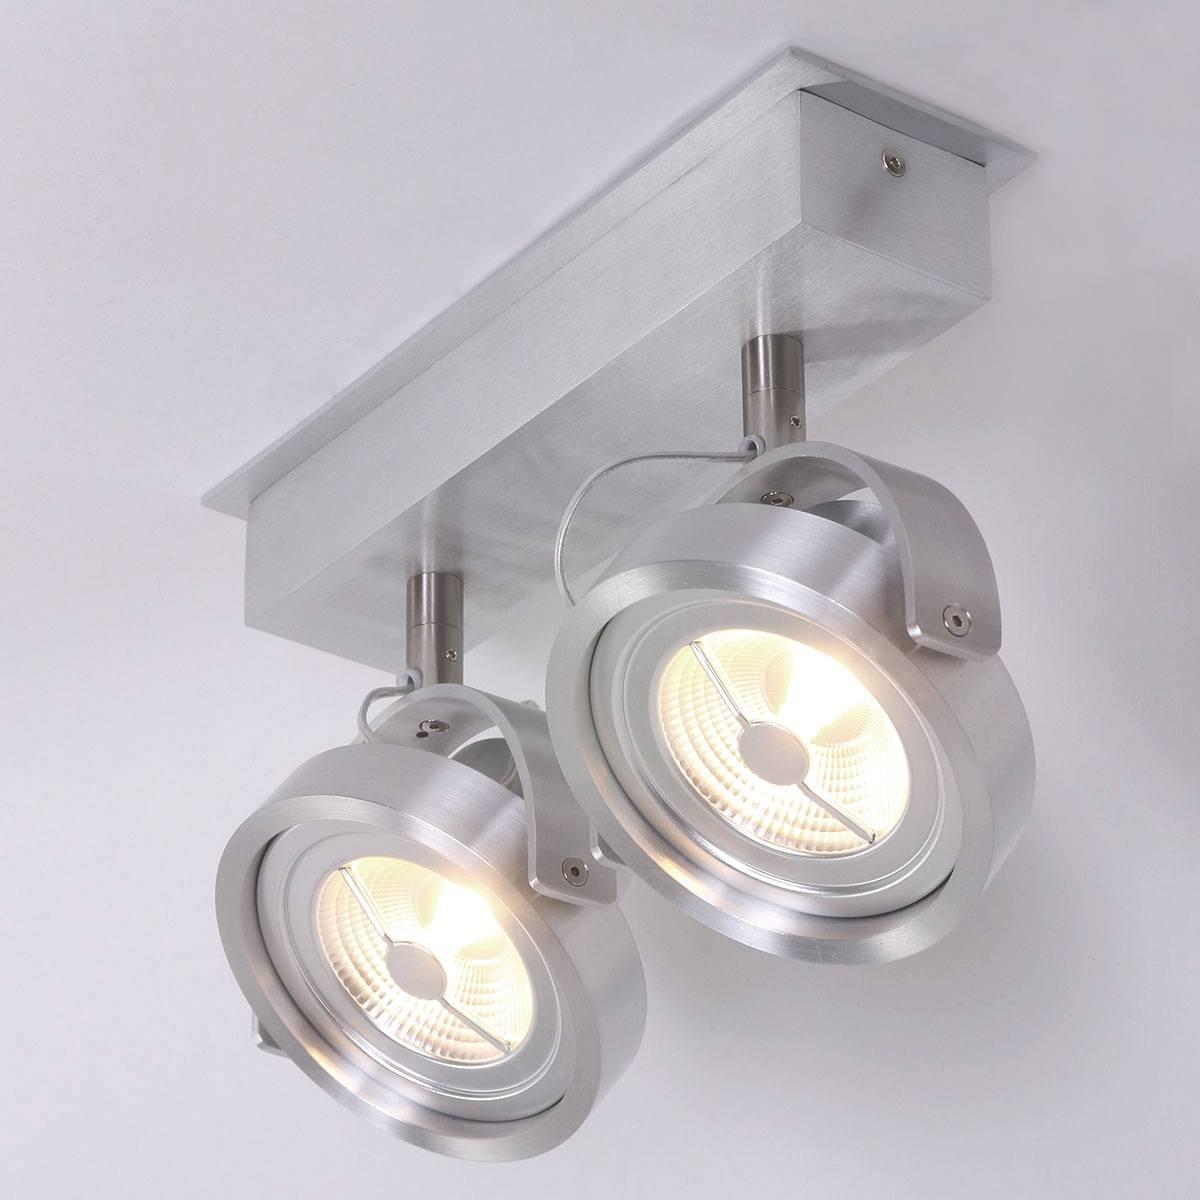 Industriele plafondlamp met twee spots